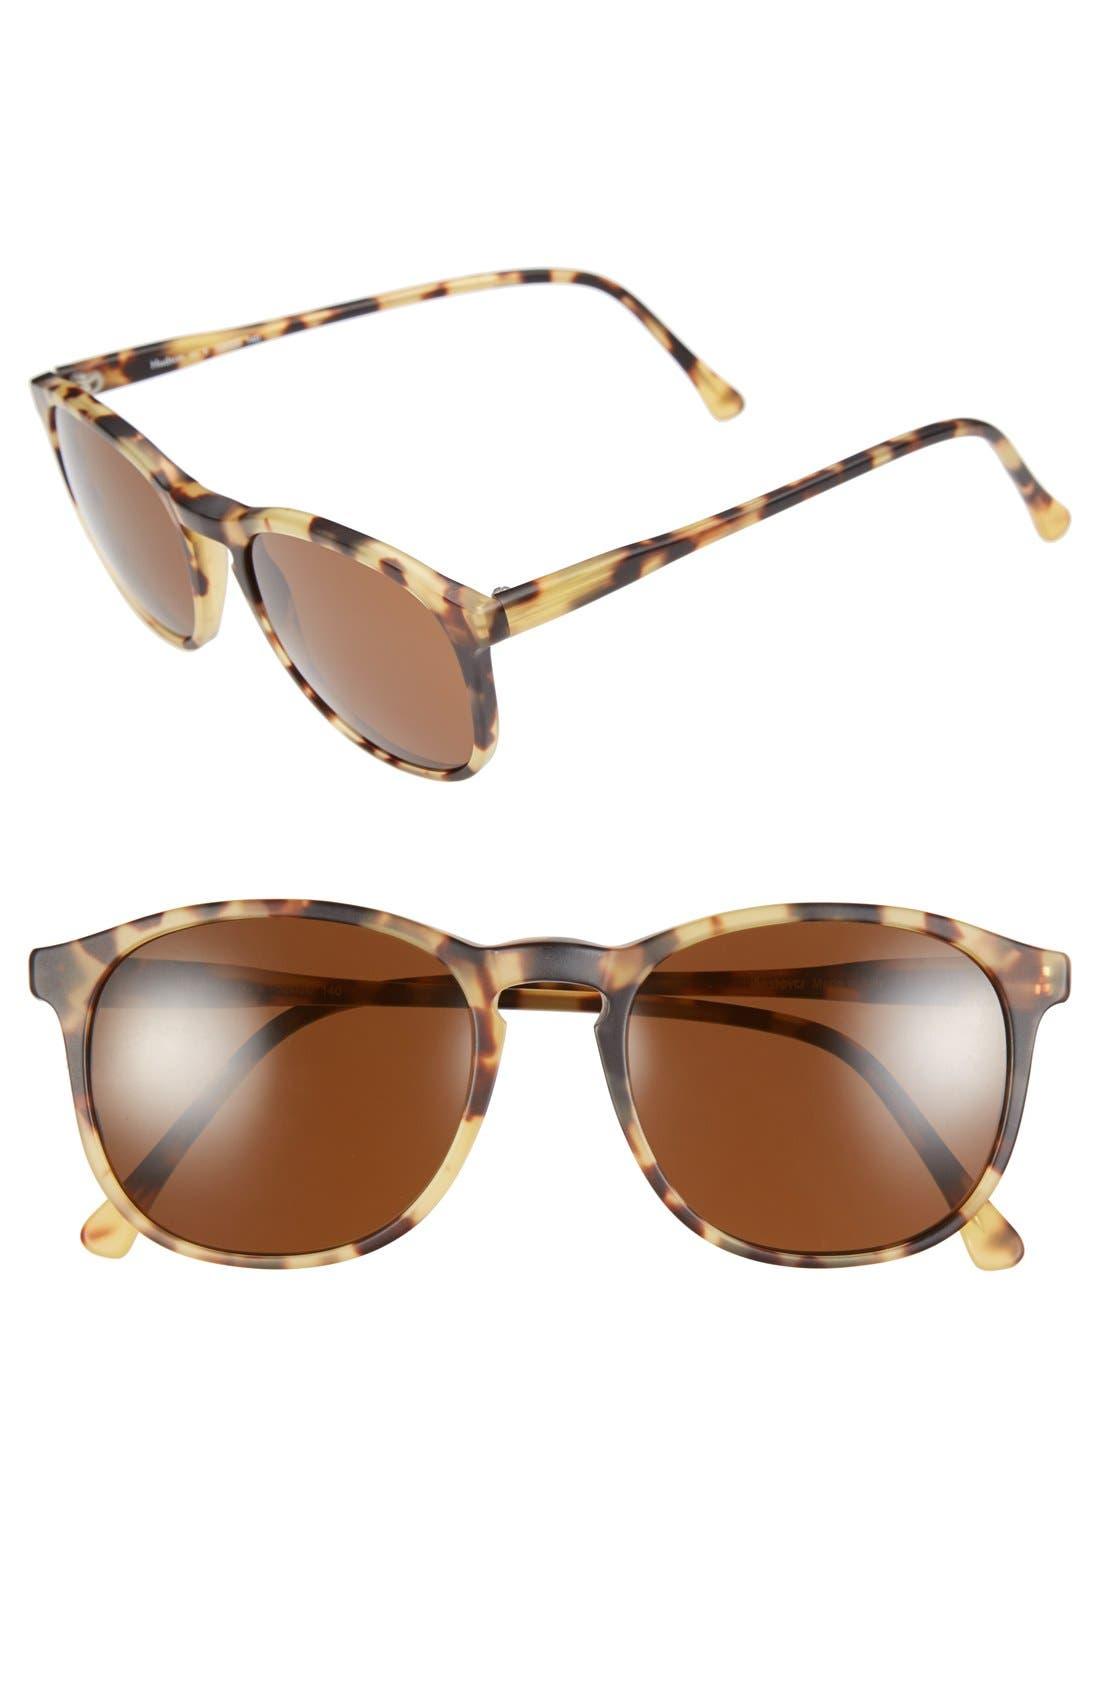 Alternate Image 1 Selected - Illesteva 'Hudson' 52mm Keyhole Sunglasses